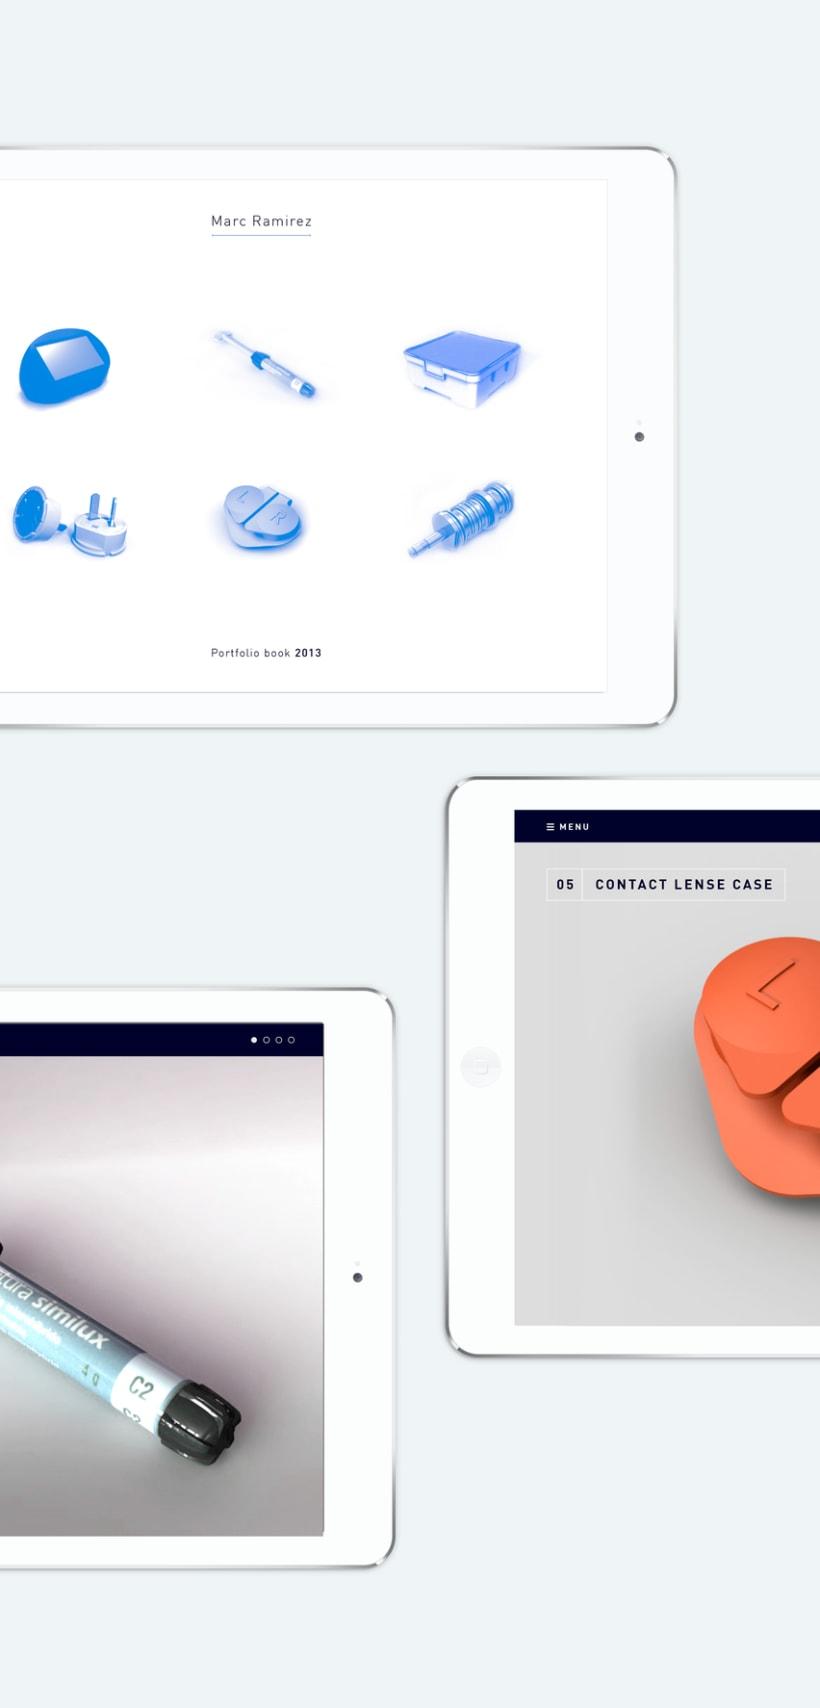 Portfolio interactivo / identidad corporativa Marc Ramirez 17